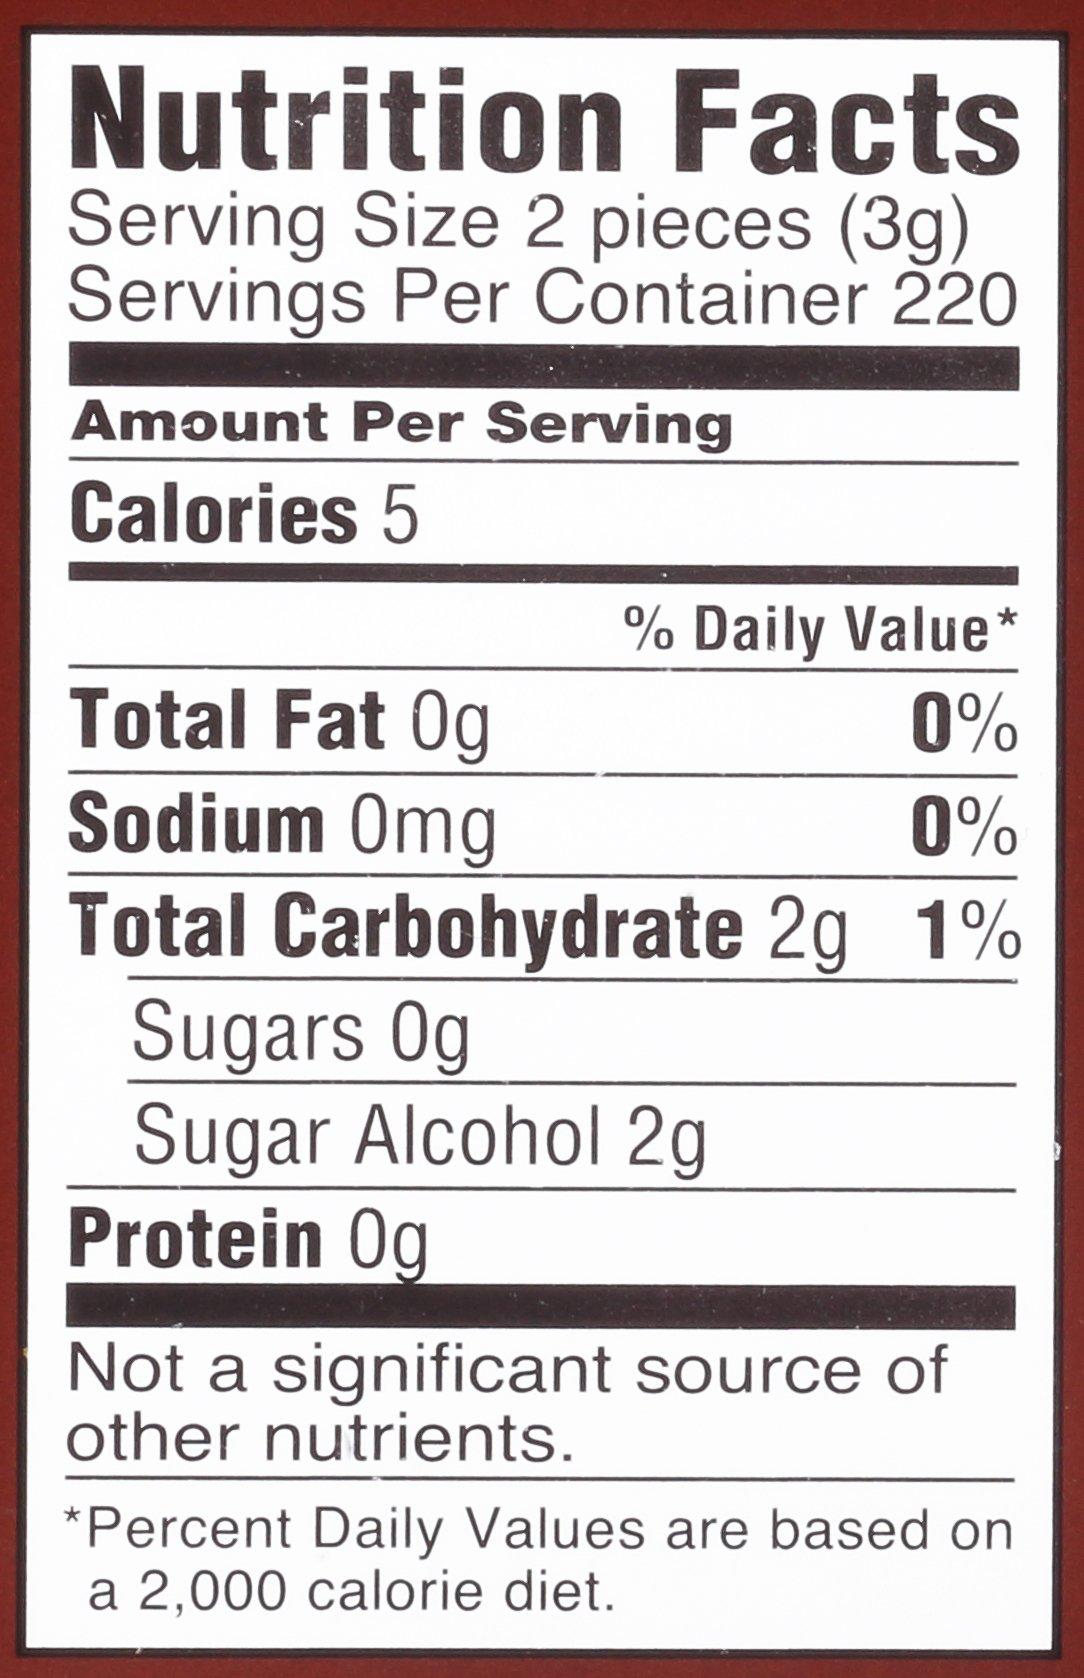 Dentyne Fire Spicy Cinnamon Sugar Free Chewing Gum Bag  110 Count (Pack of 4)